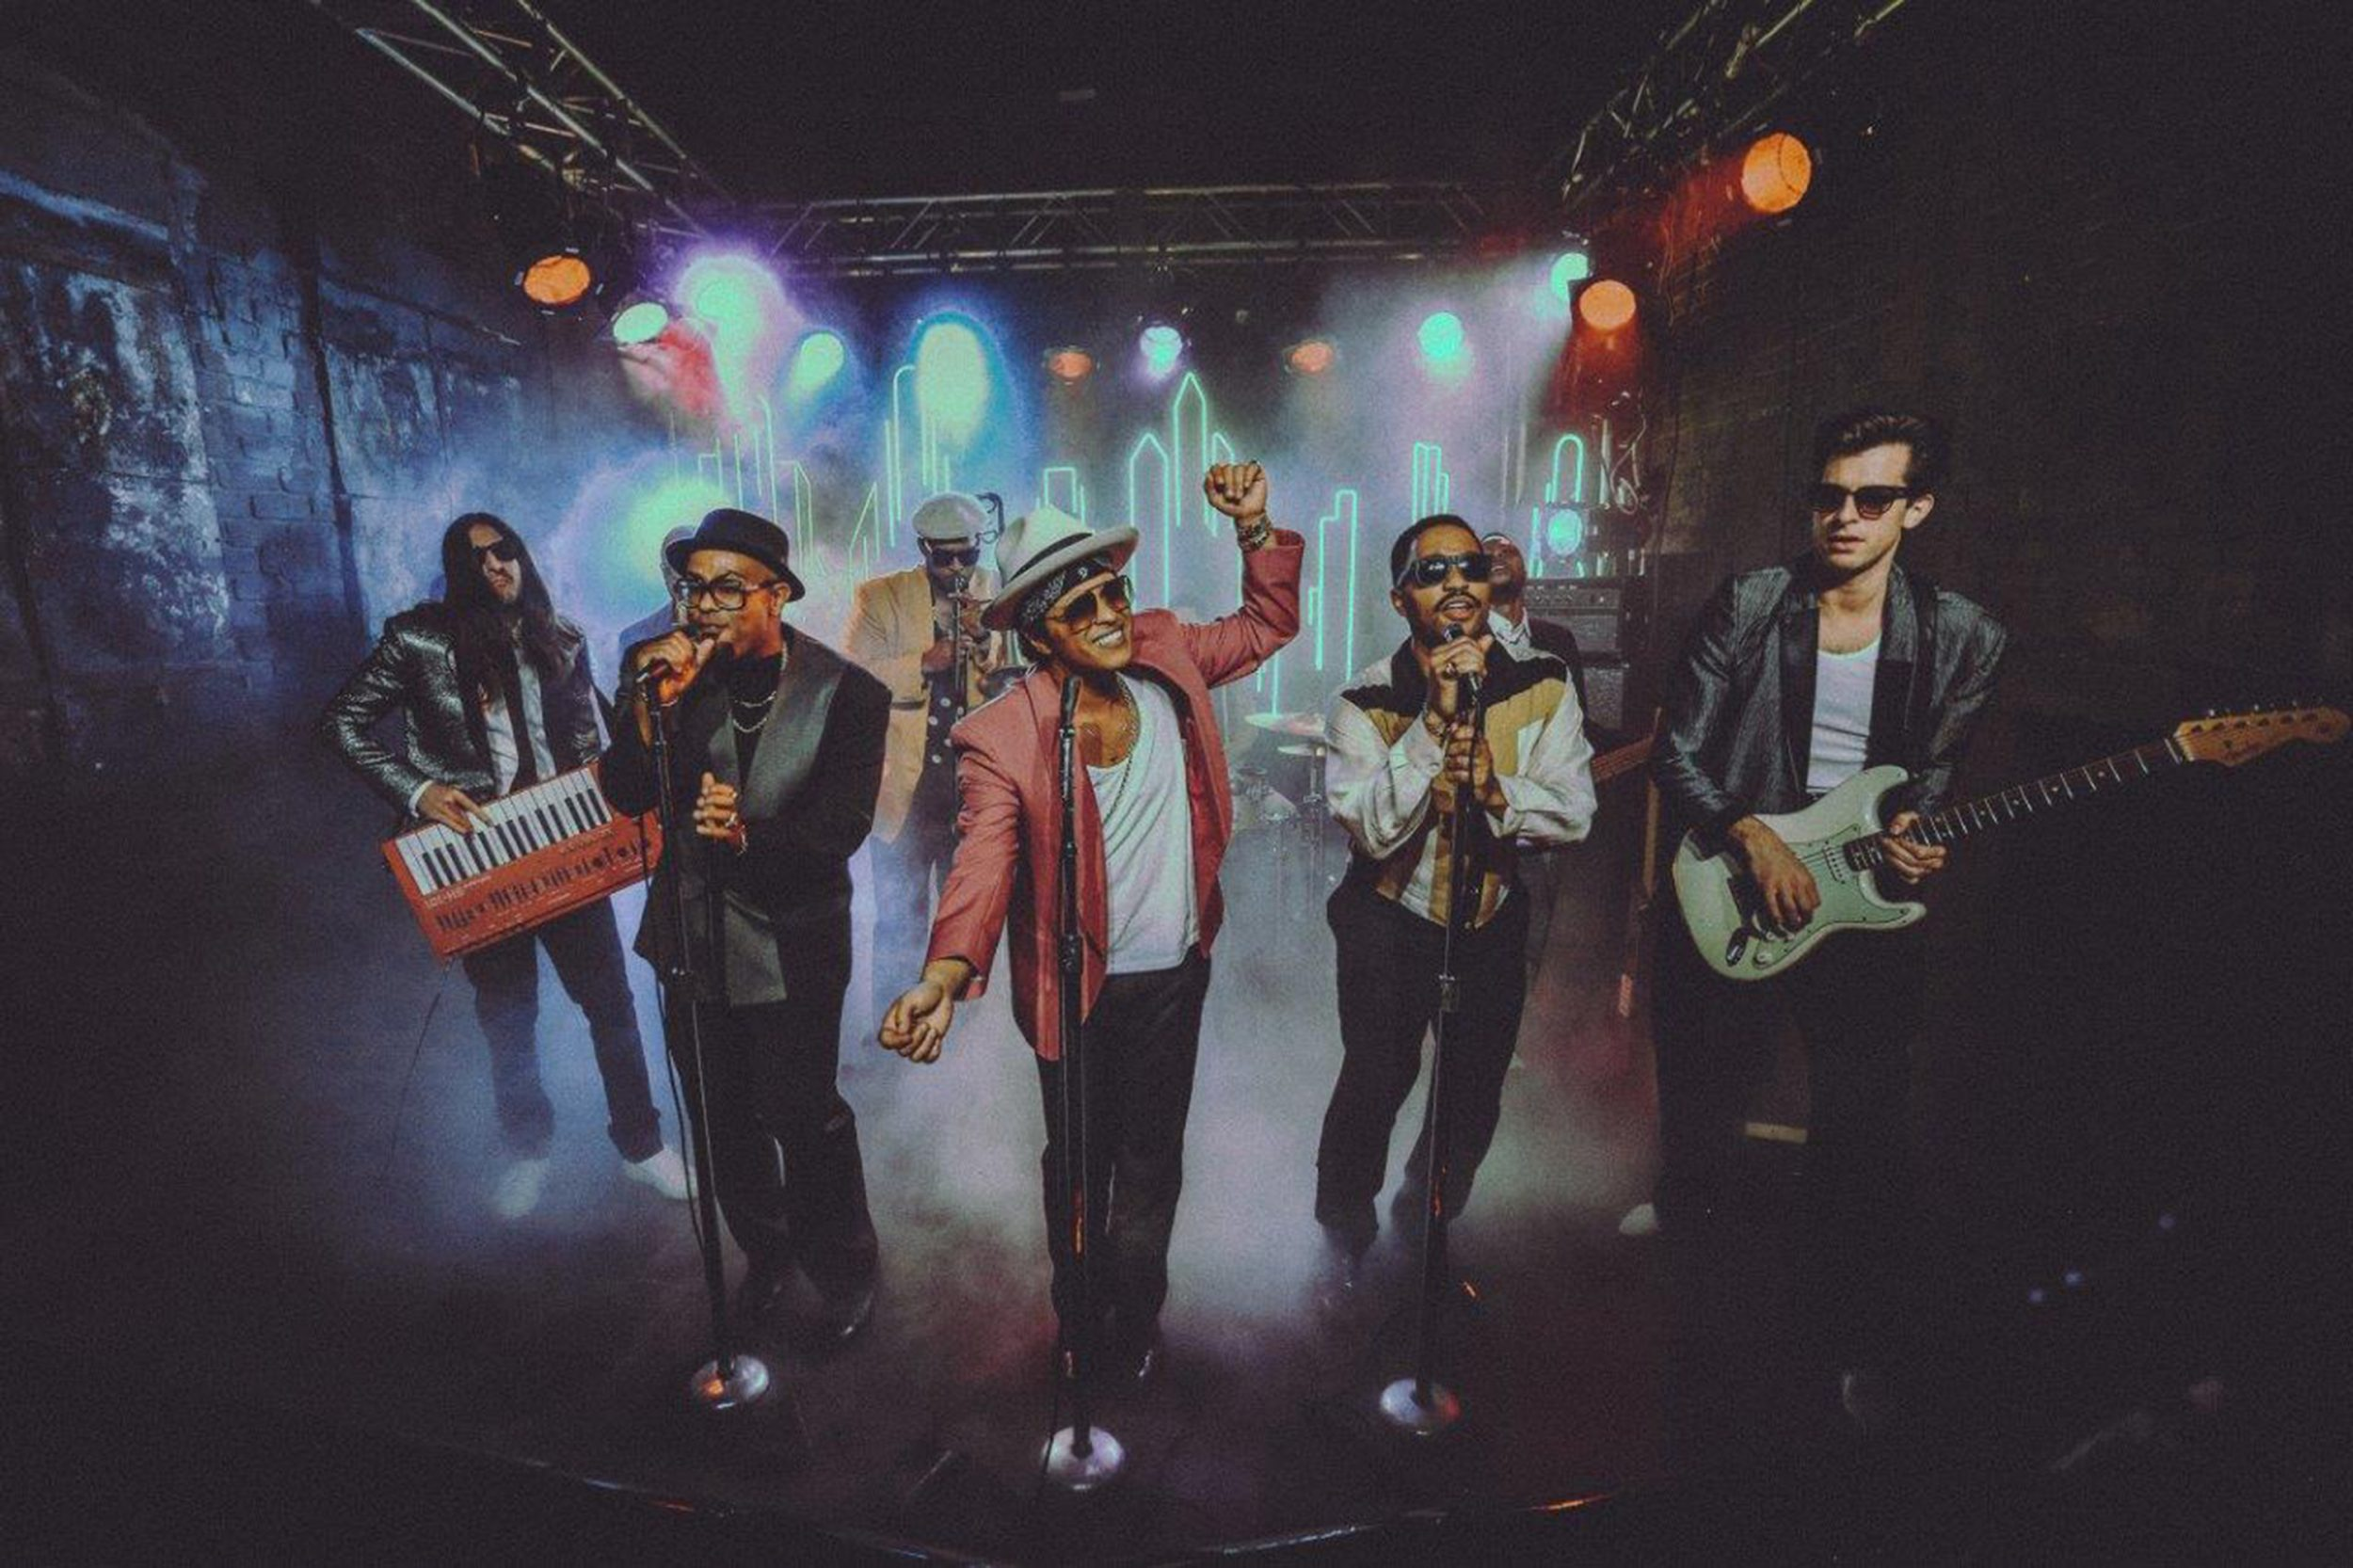 Uptown funk feat. bruno mars mark ronson скачать